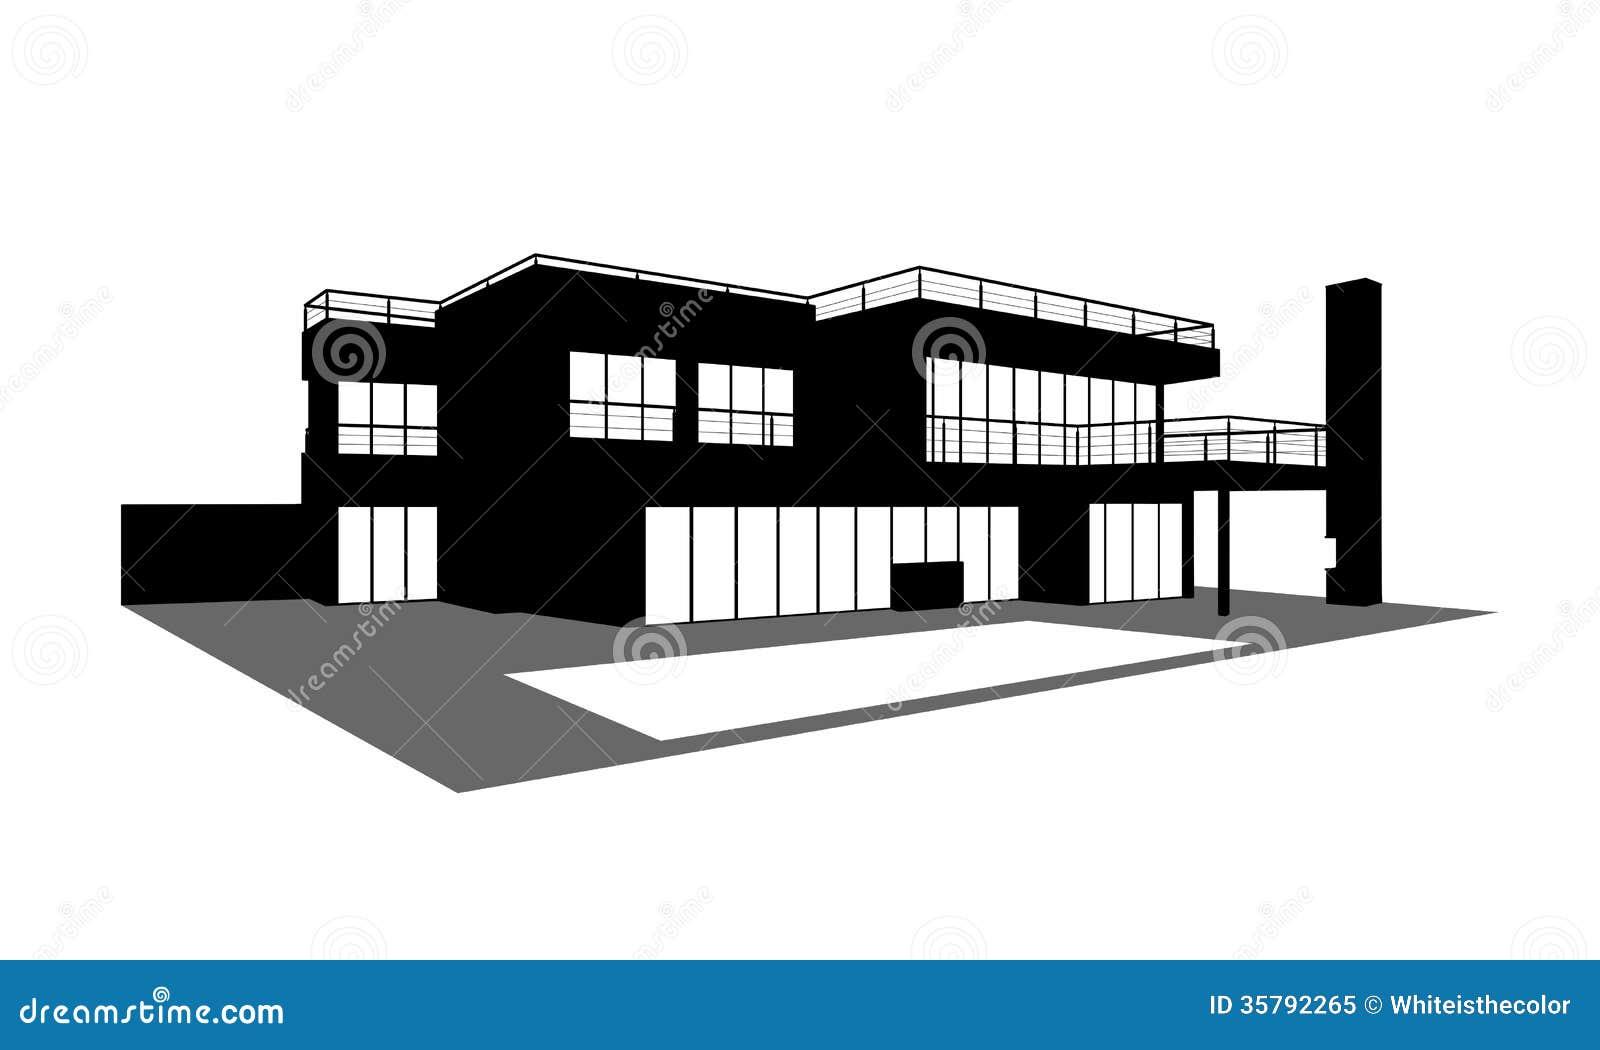 Maison contemporaine avec une silhouette de piscine for Piscine xs prix